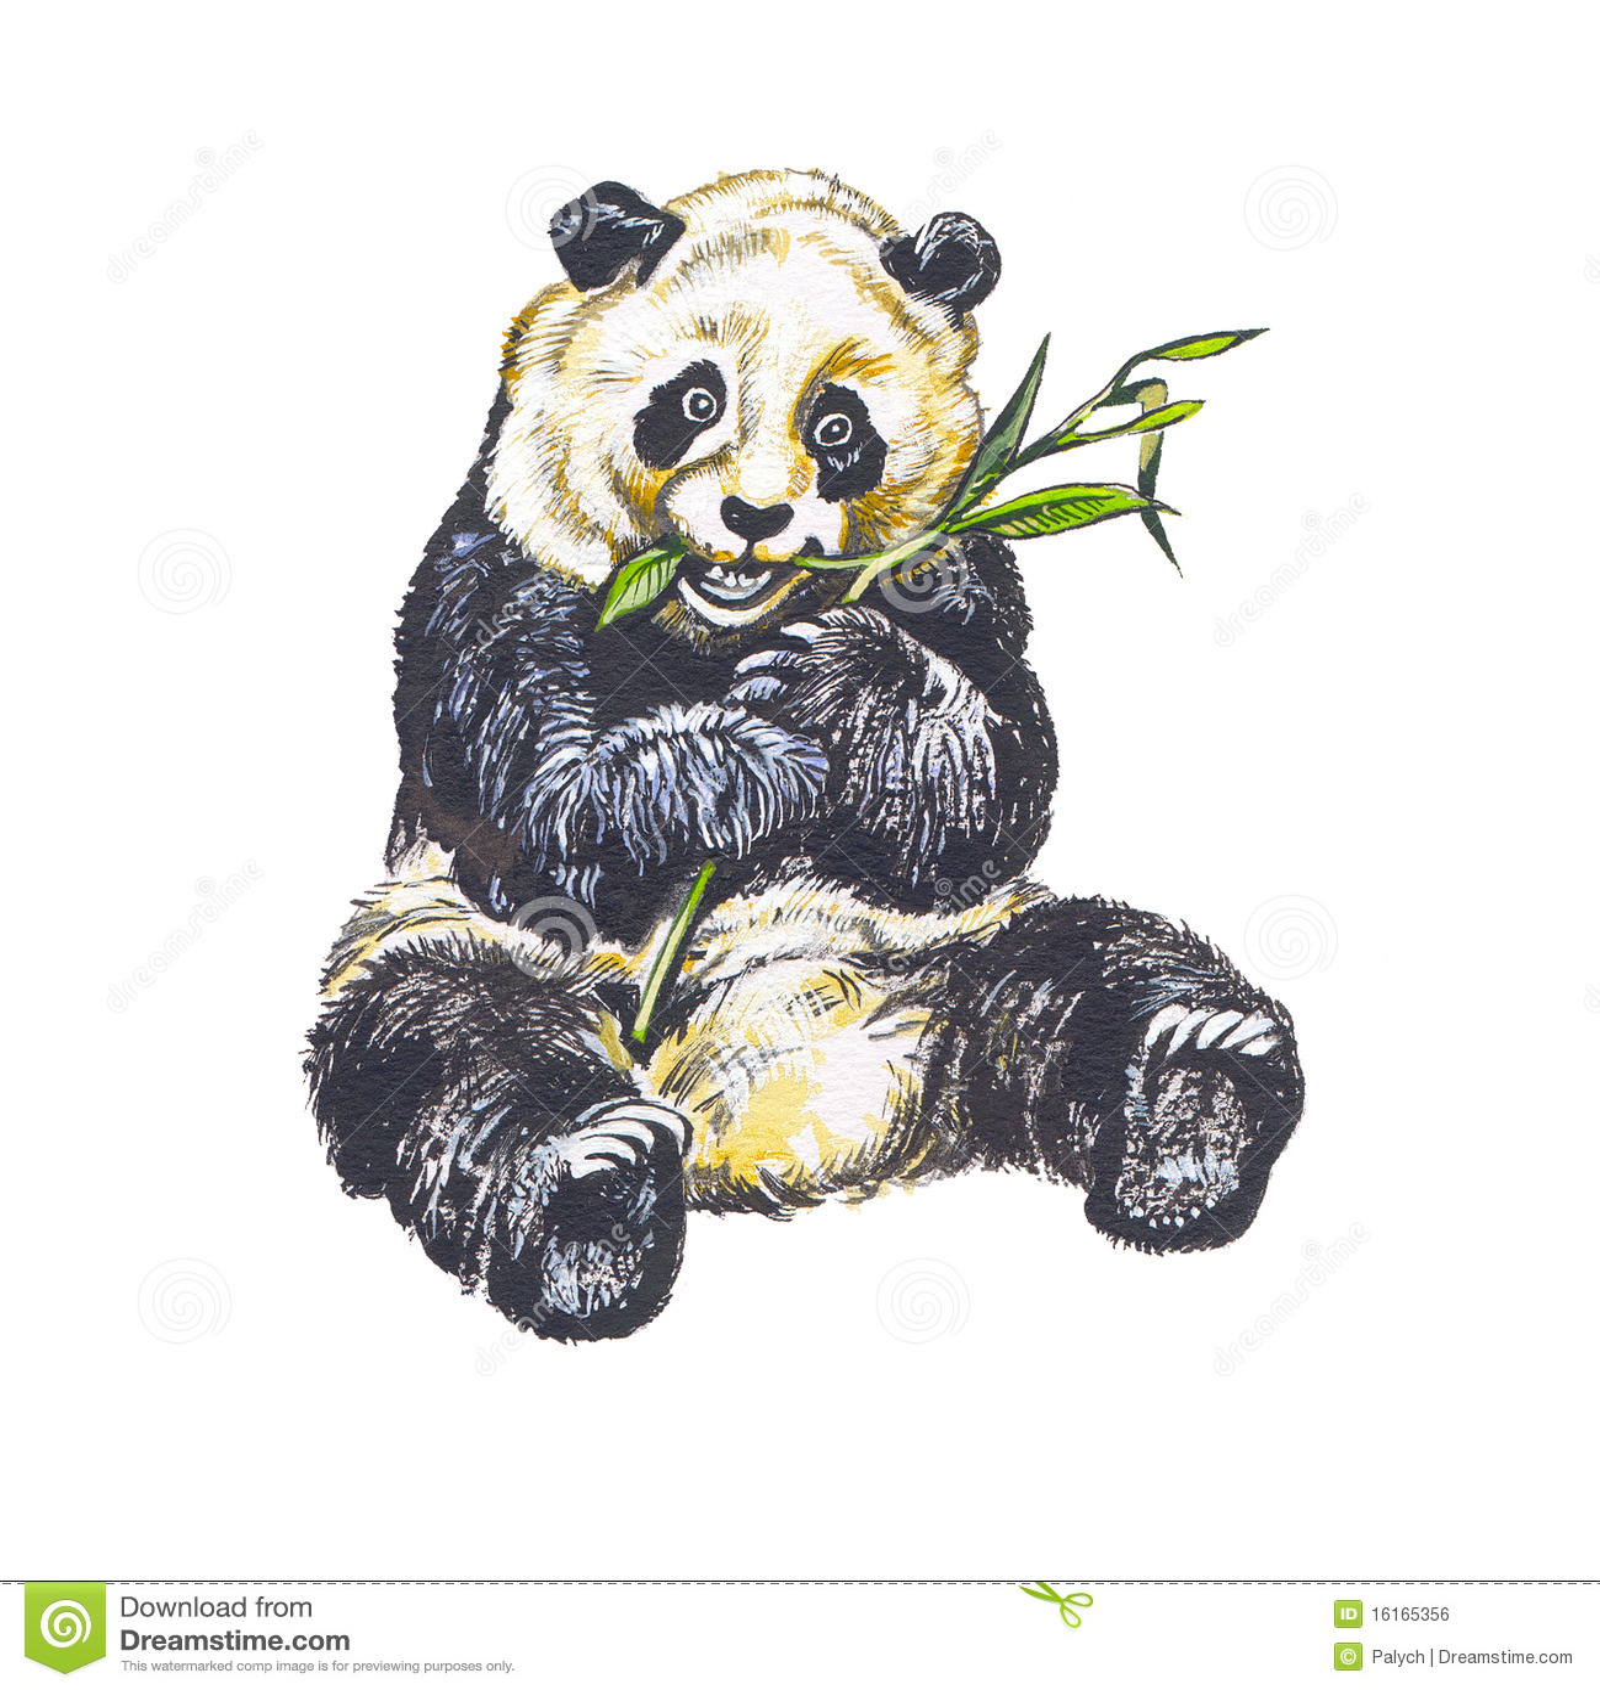 Giant Panda Royalty Free Stock Image Image 16165356